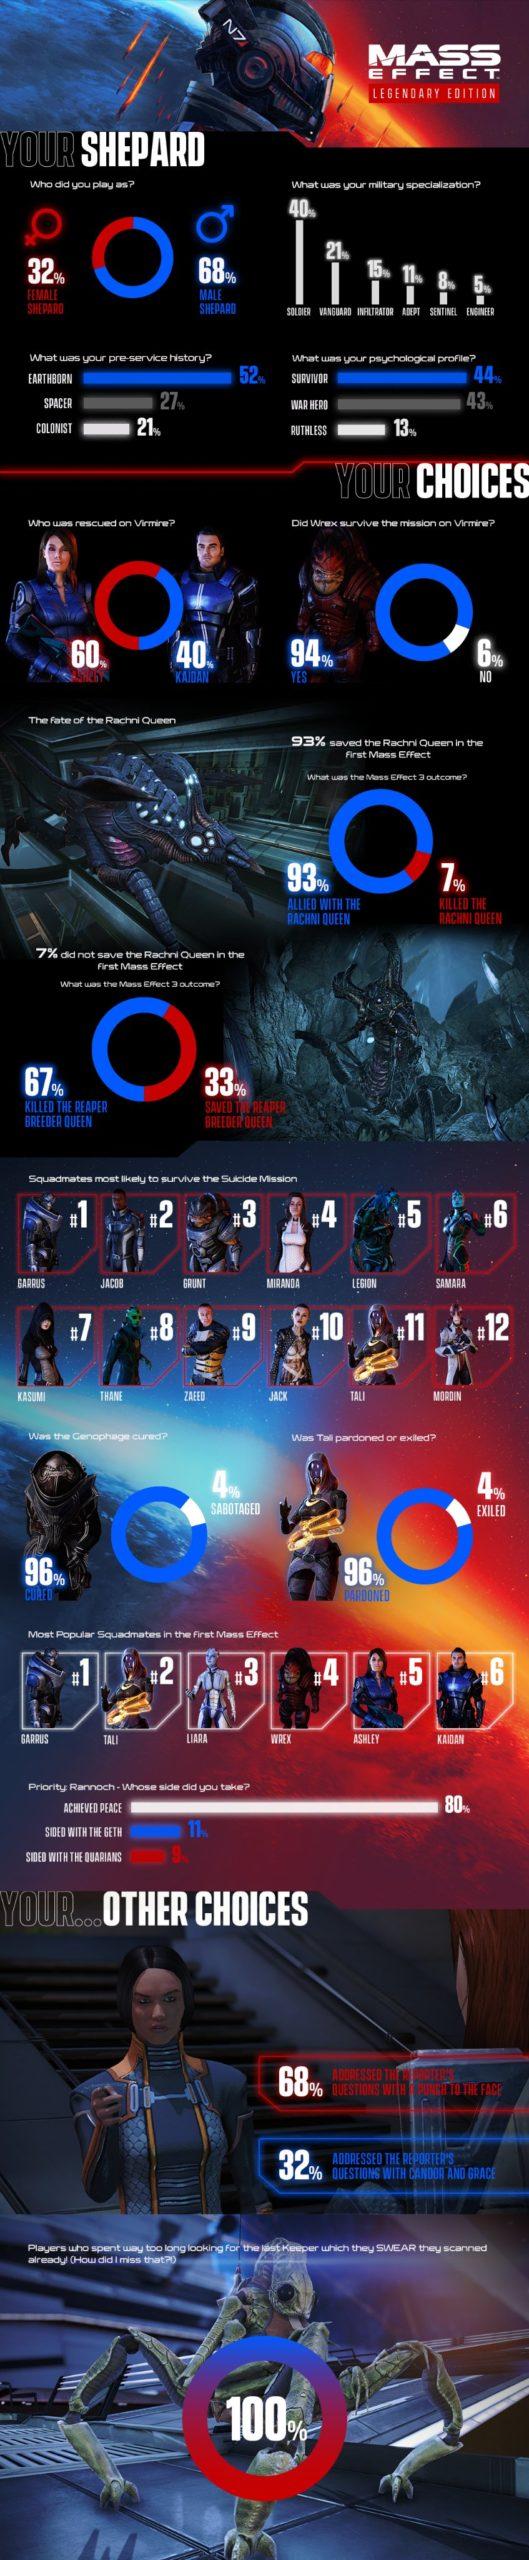 Statistiky z Mass Effect: Legendary Edition Infografika scaled